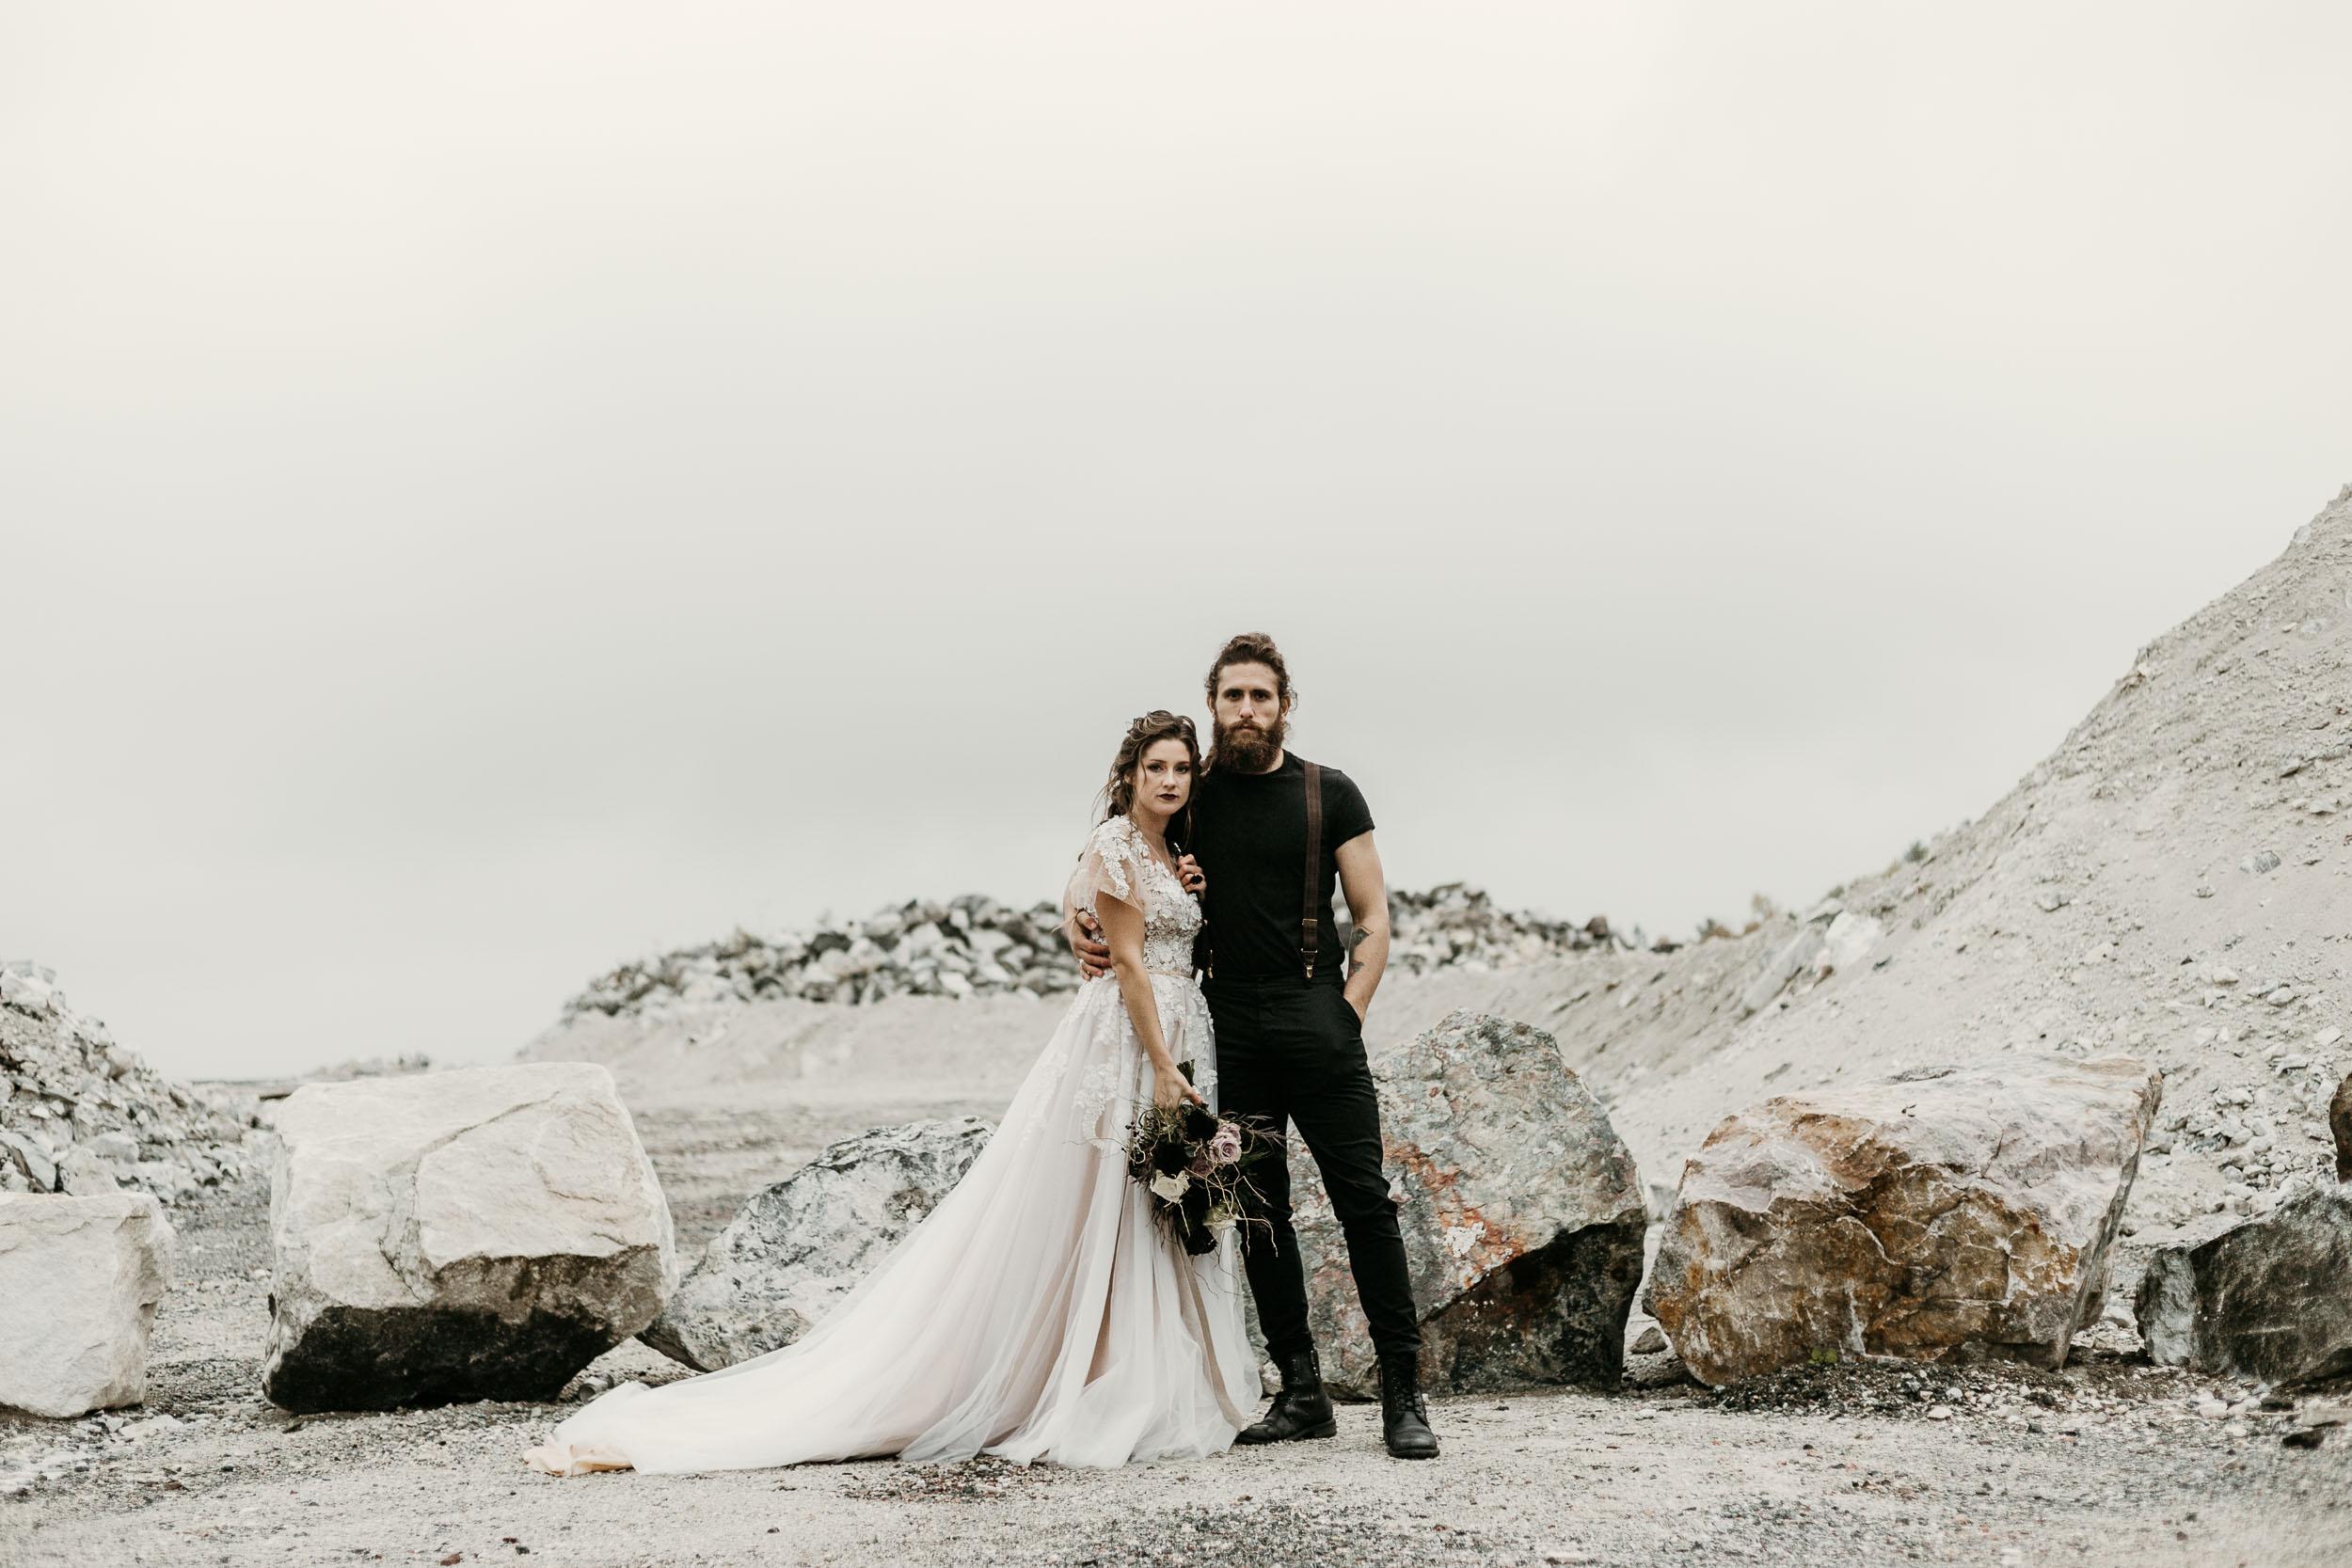 intimate-wedding-elopement-photographer-ottawa-toronto-1038.jpg